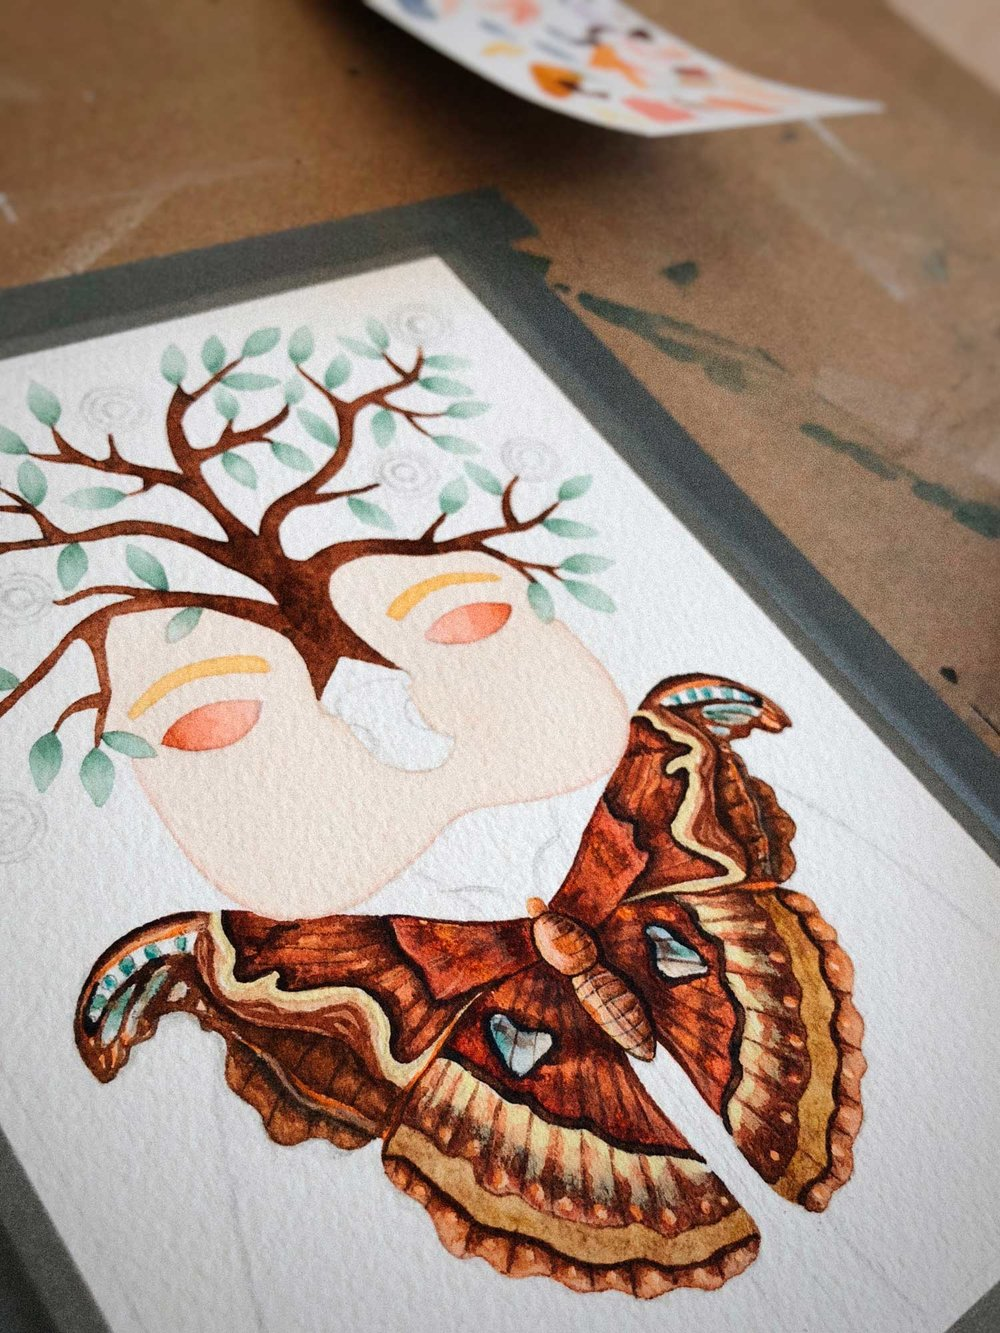 why owls? -